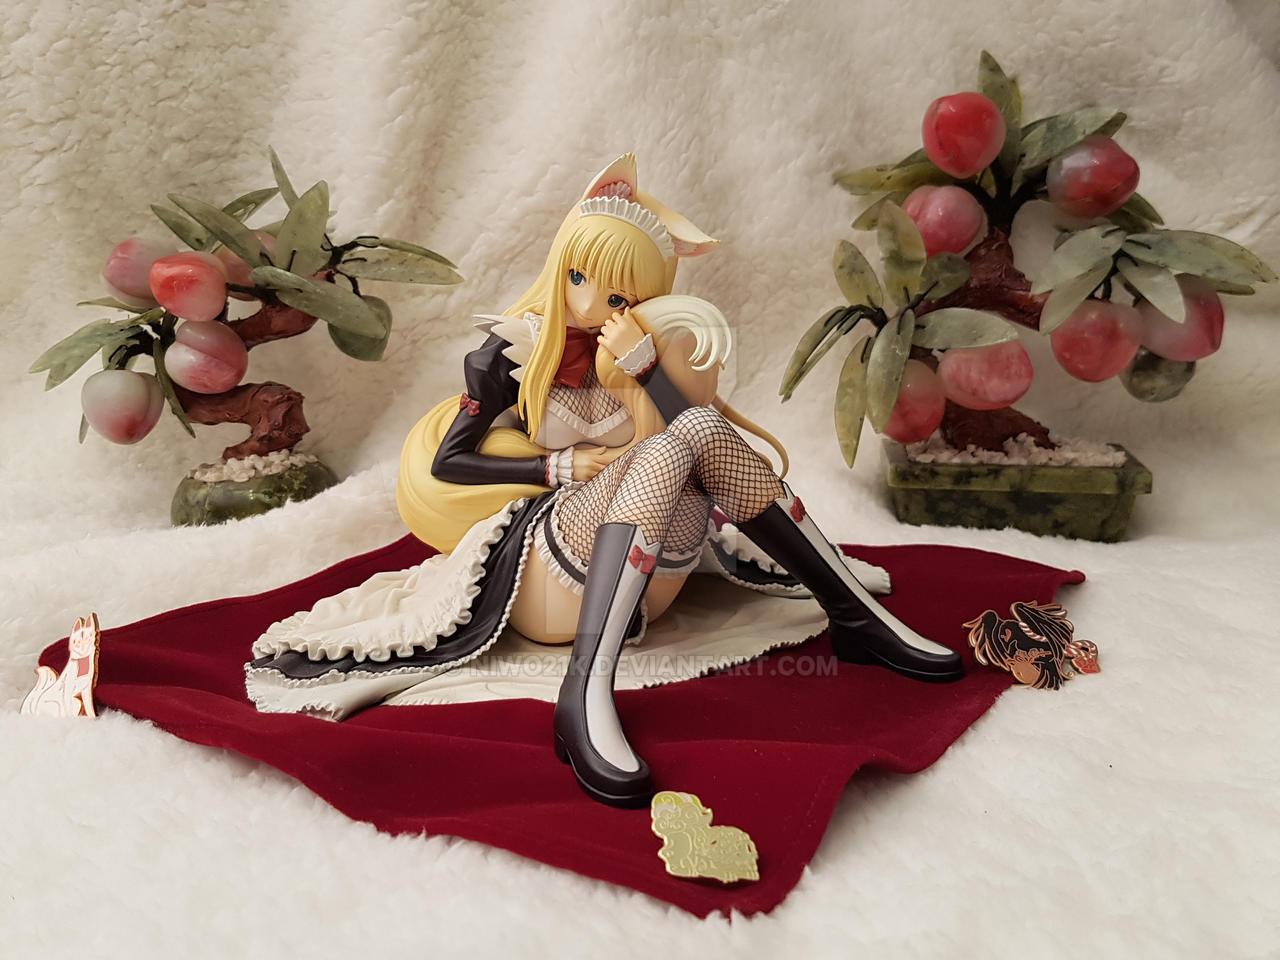 Sweet Lorna Murasame - for Ogawa Burukku by NiWo21k